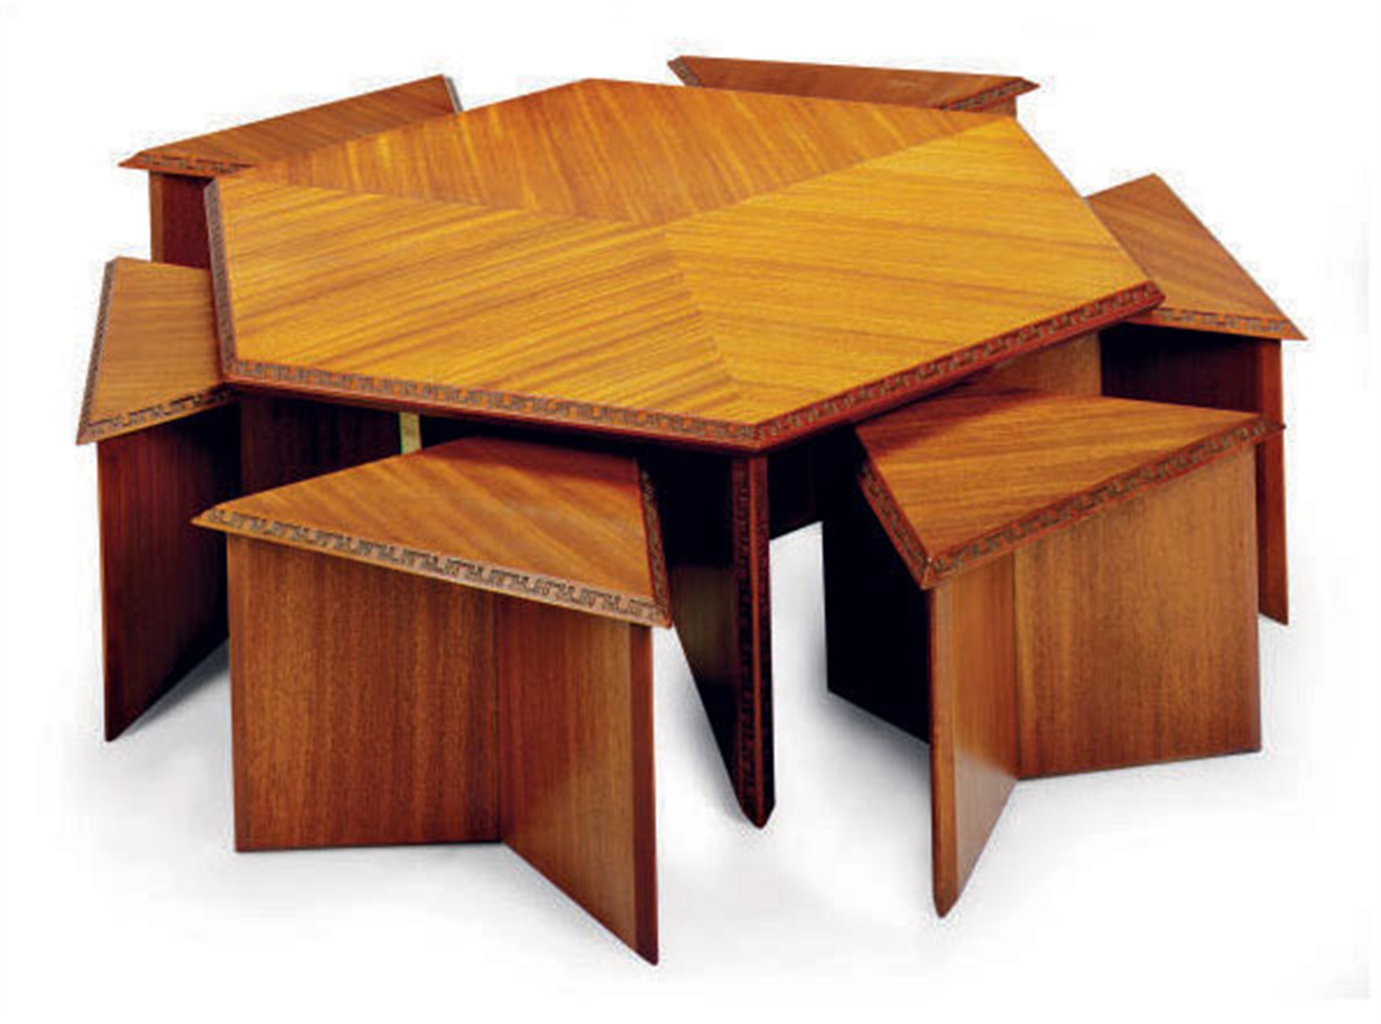 A Mahogany Taliesin Hexagonal Low Dining Table With Six